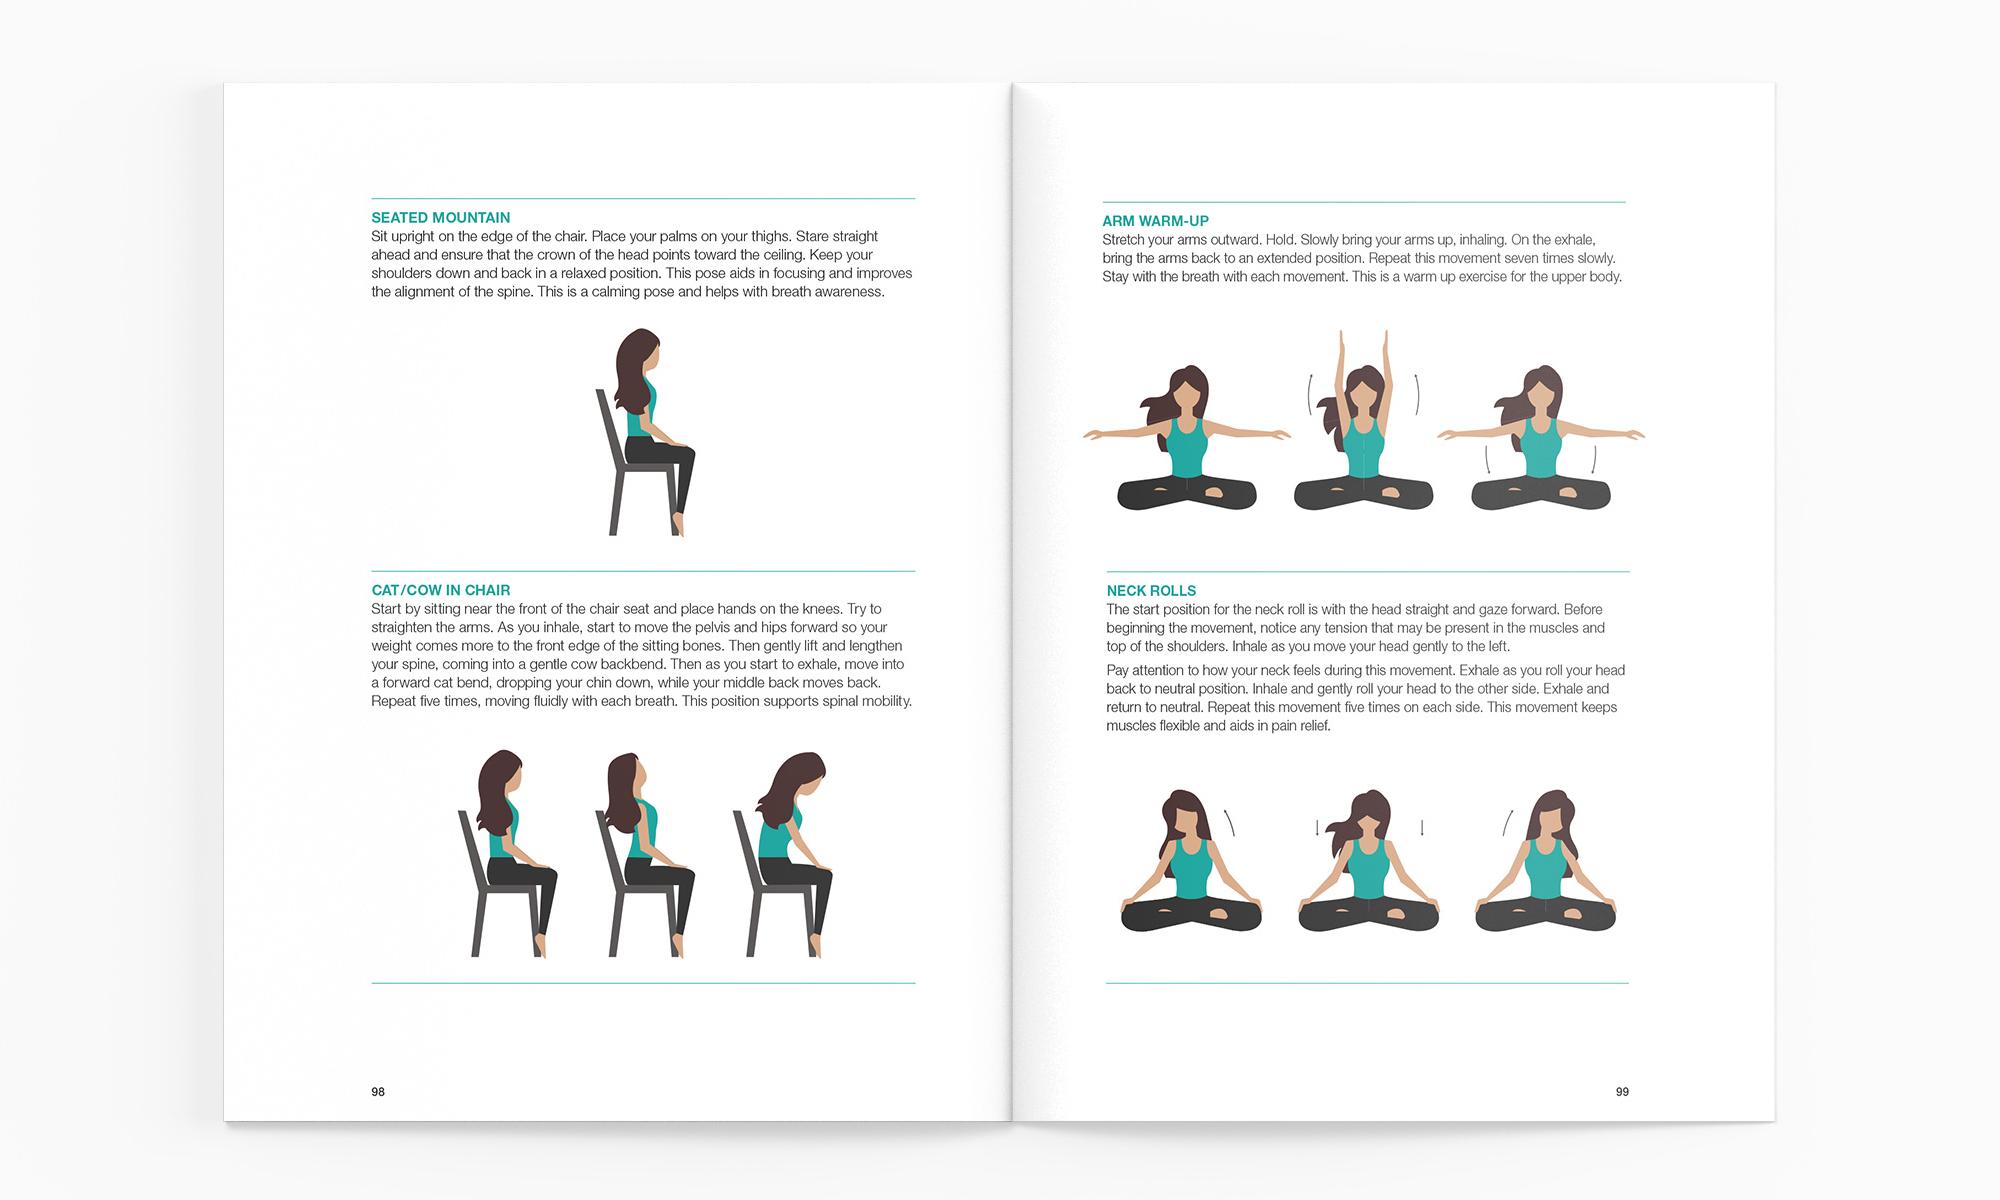 CAMH_GamblingManual_Ebbnflowcreative_Brochure_Publicationdesign_Illustration_2.jpg